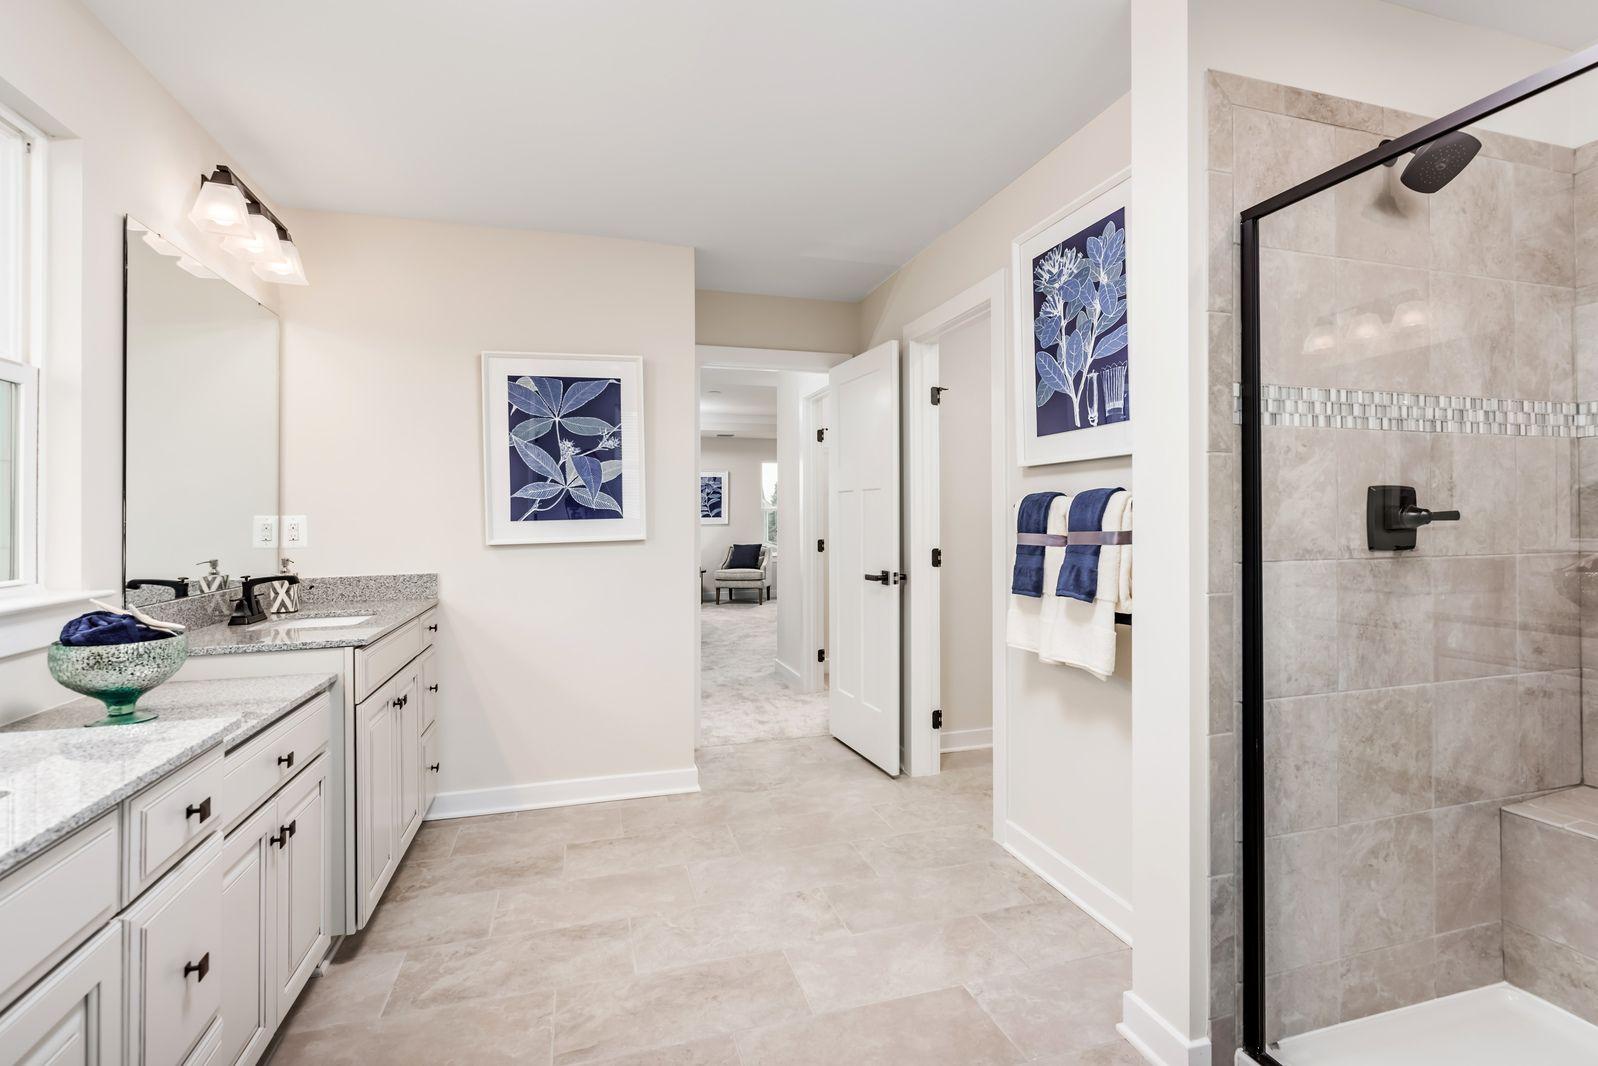 Bathroom featured in the York at Hartland By Ryan Homes in Washington, VA